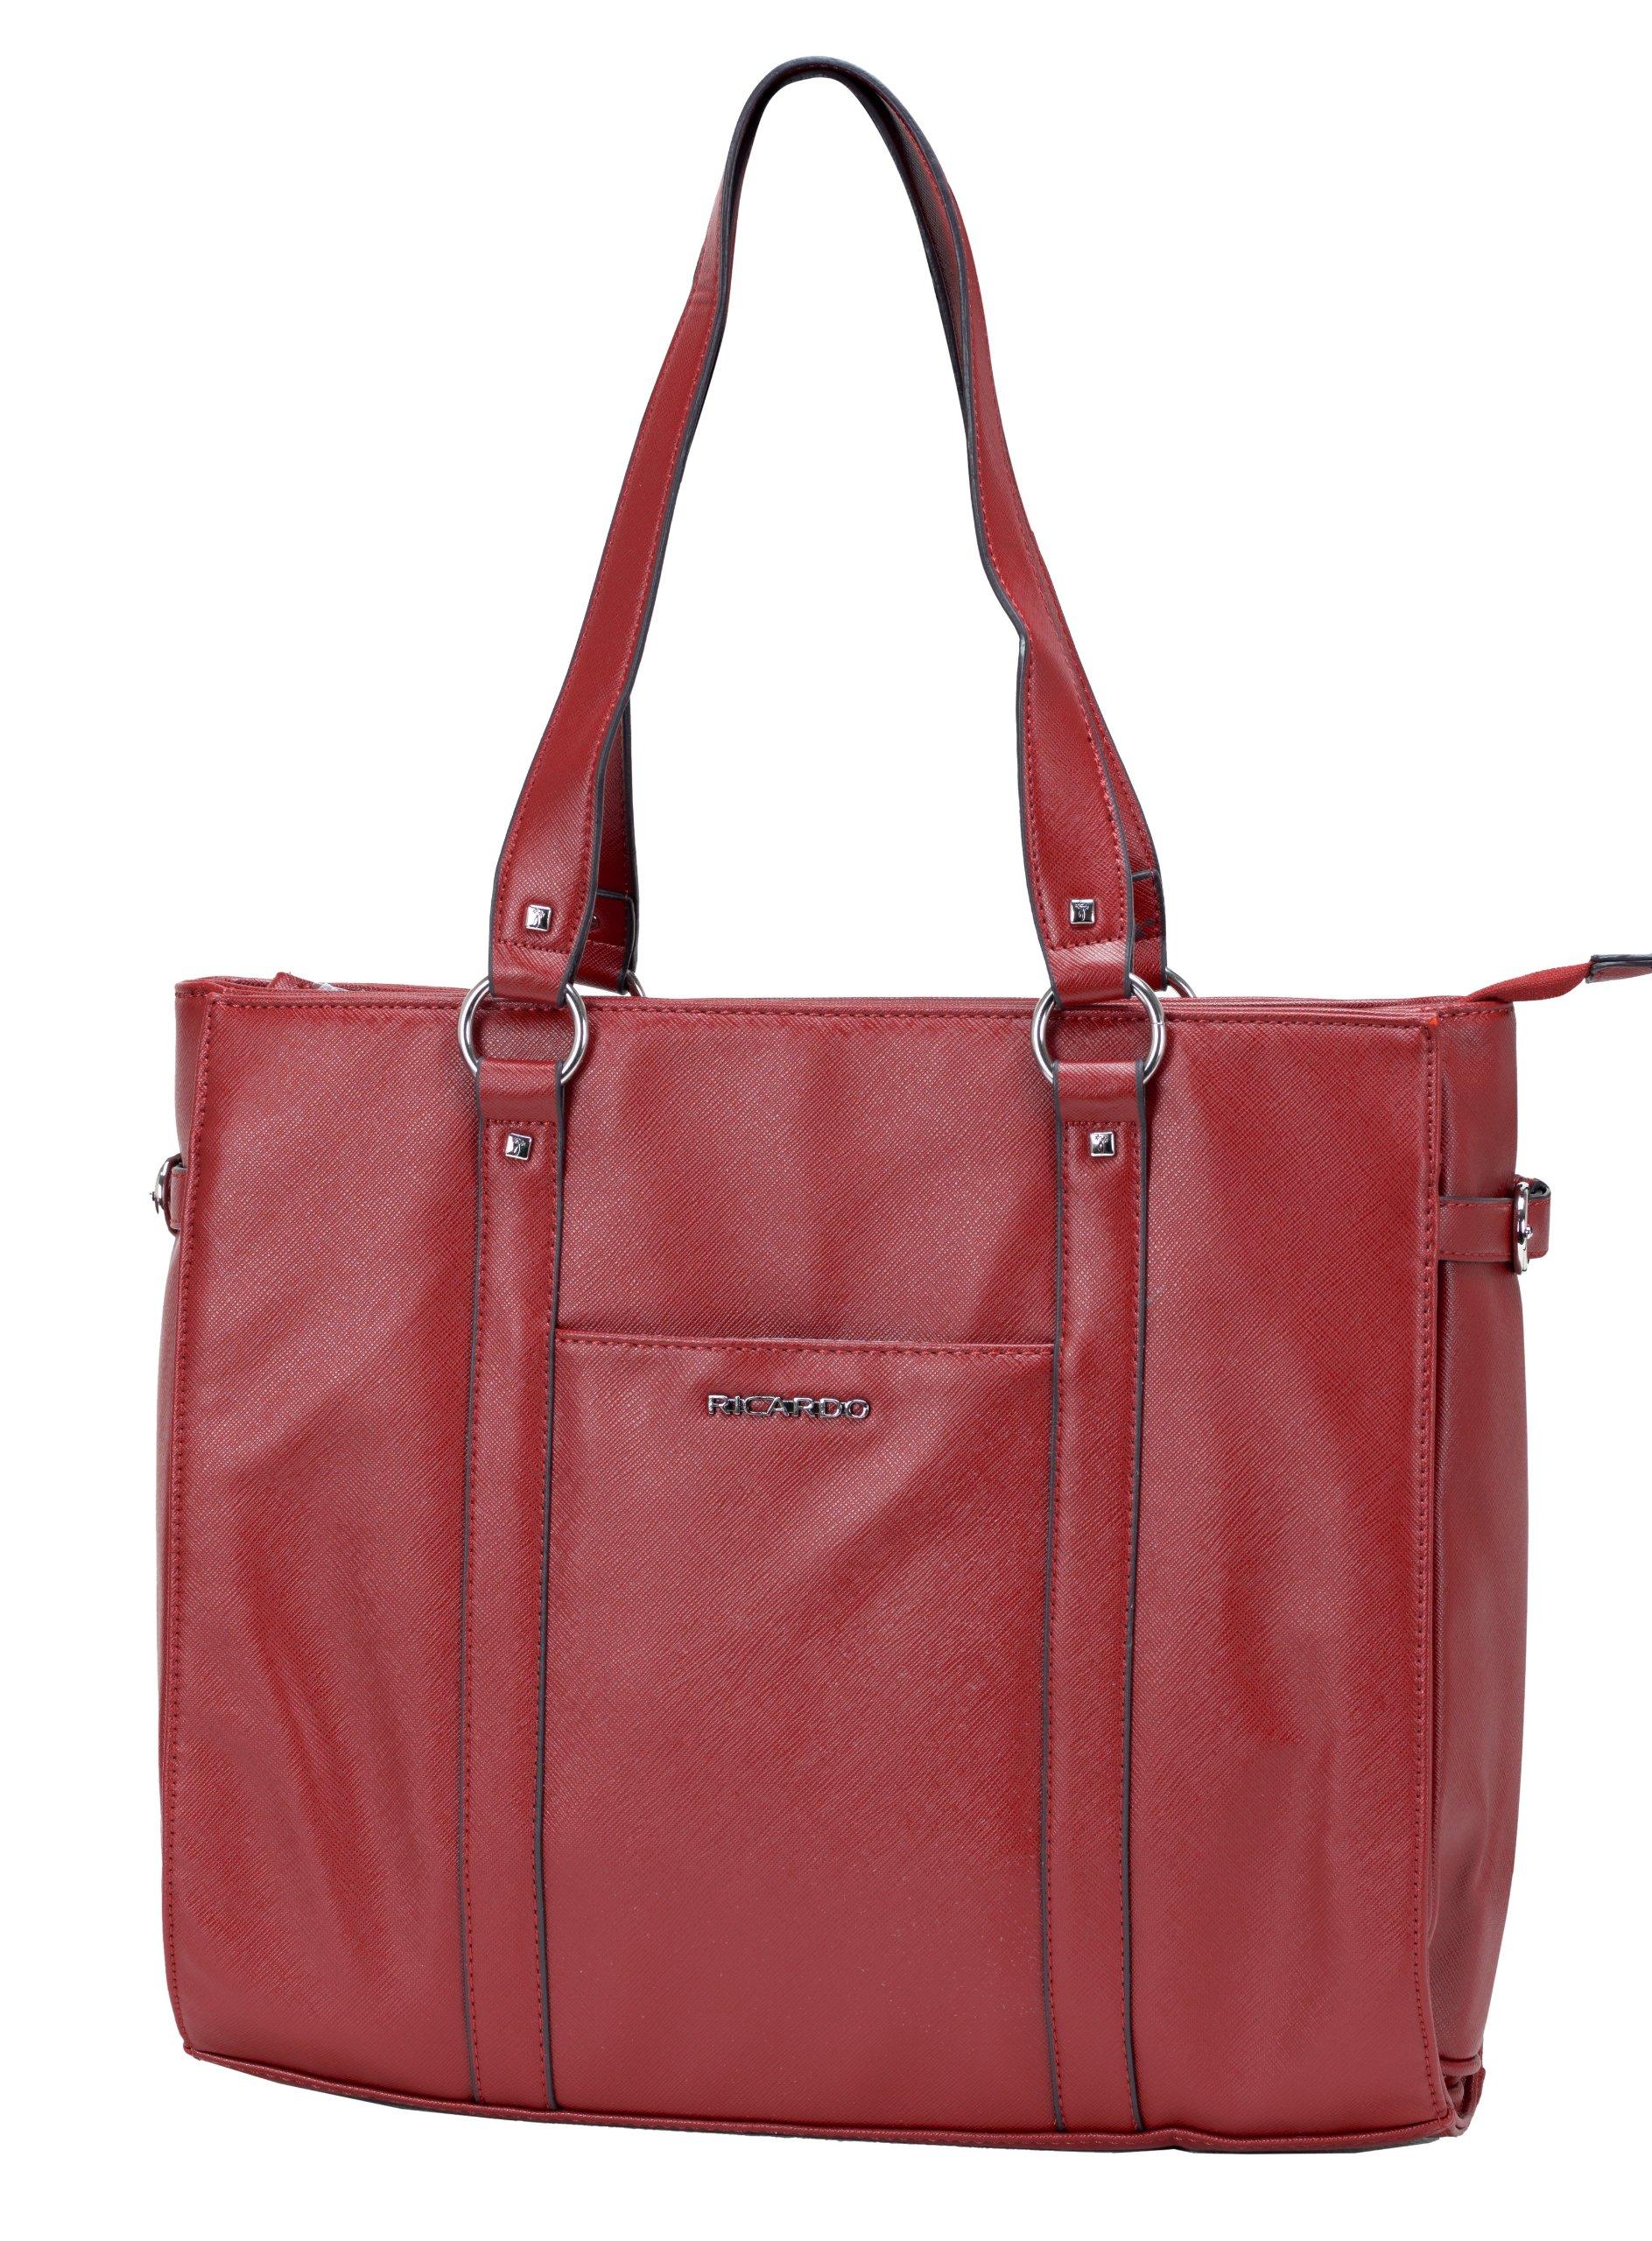 Ricardo Beverly Hills Luggage Fashion Business Tote 2, Cerise, One Size